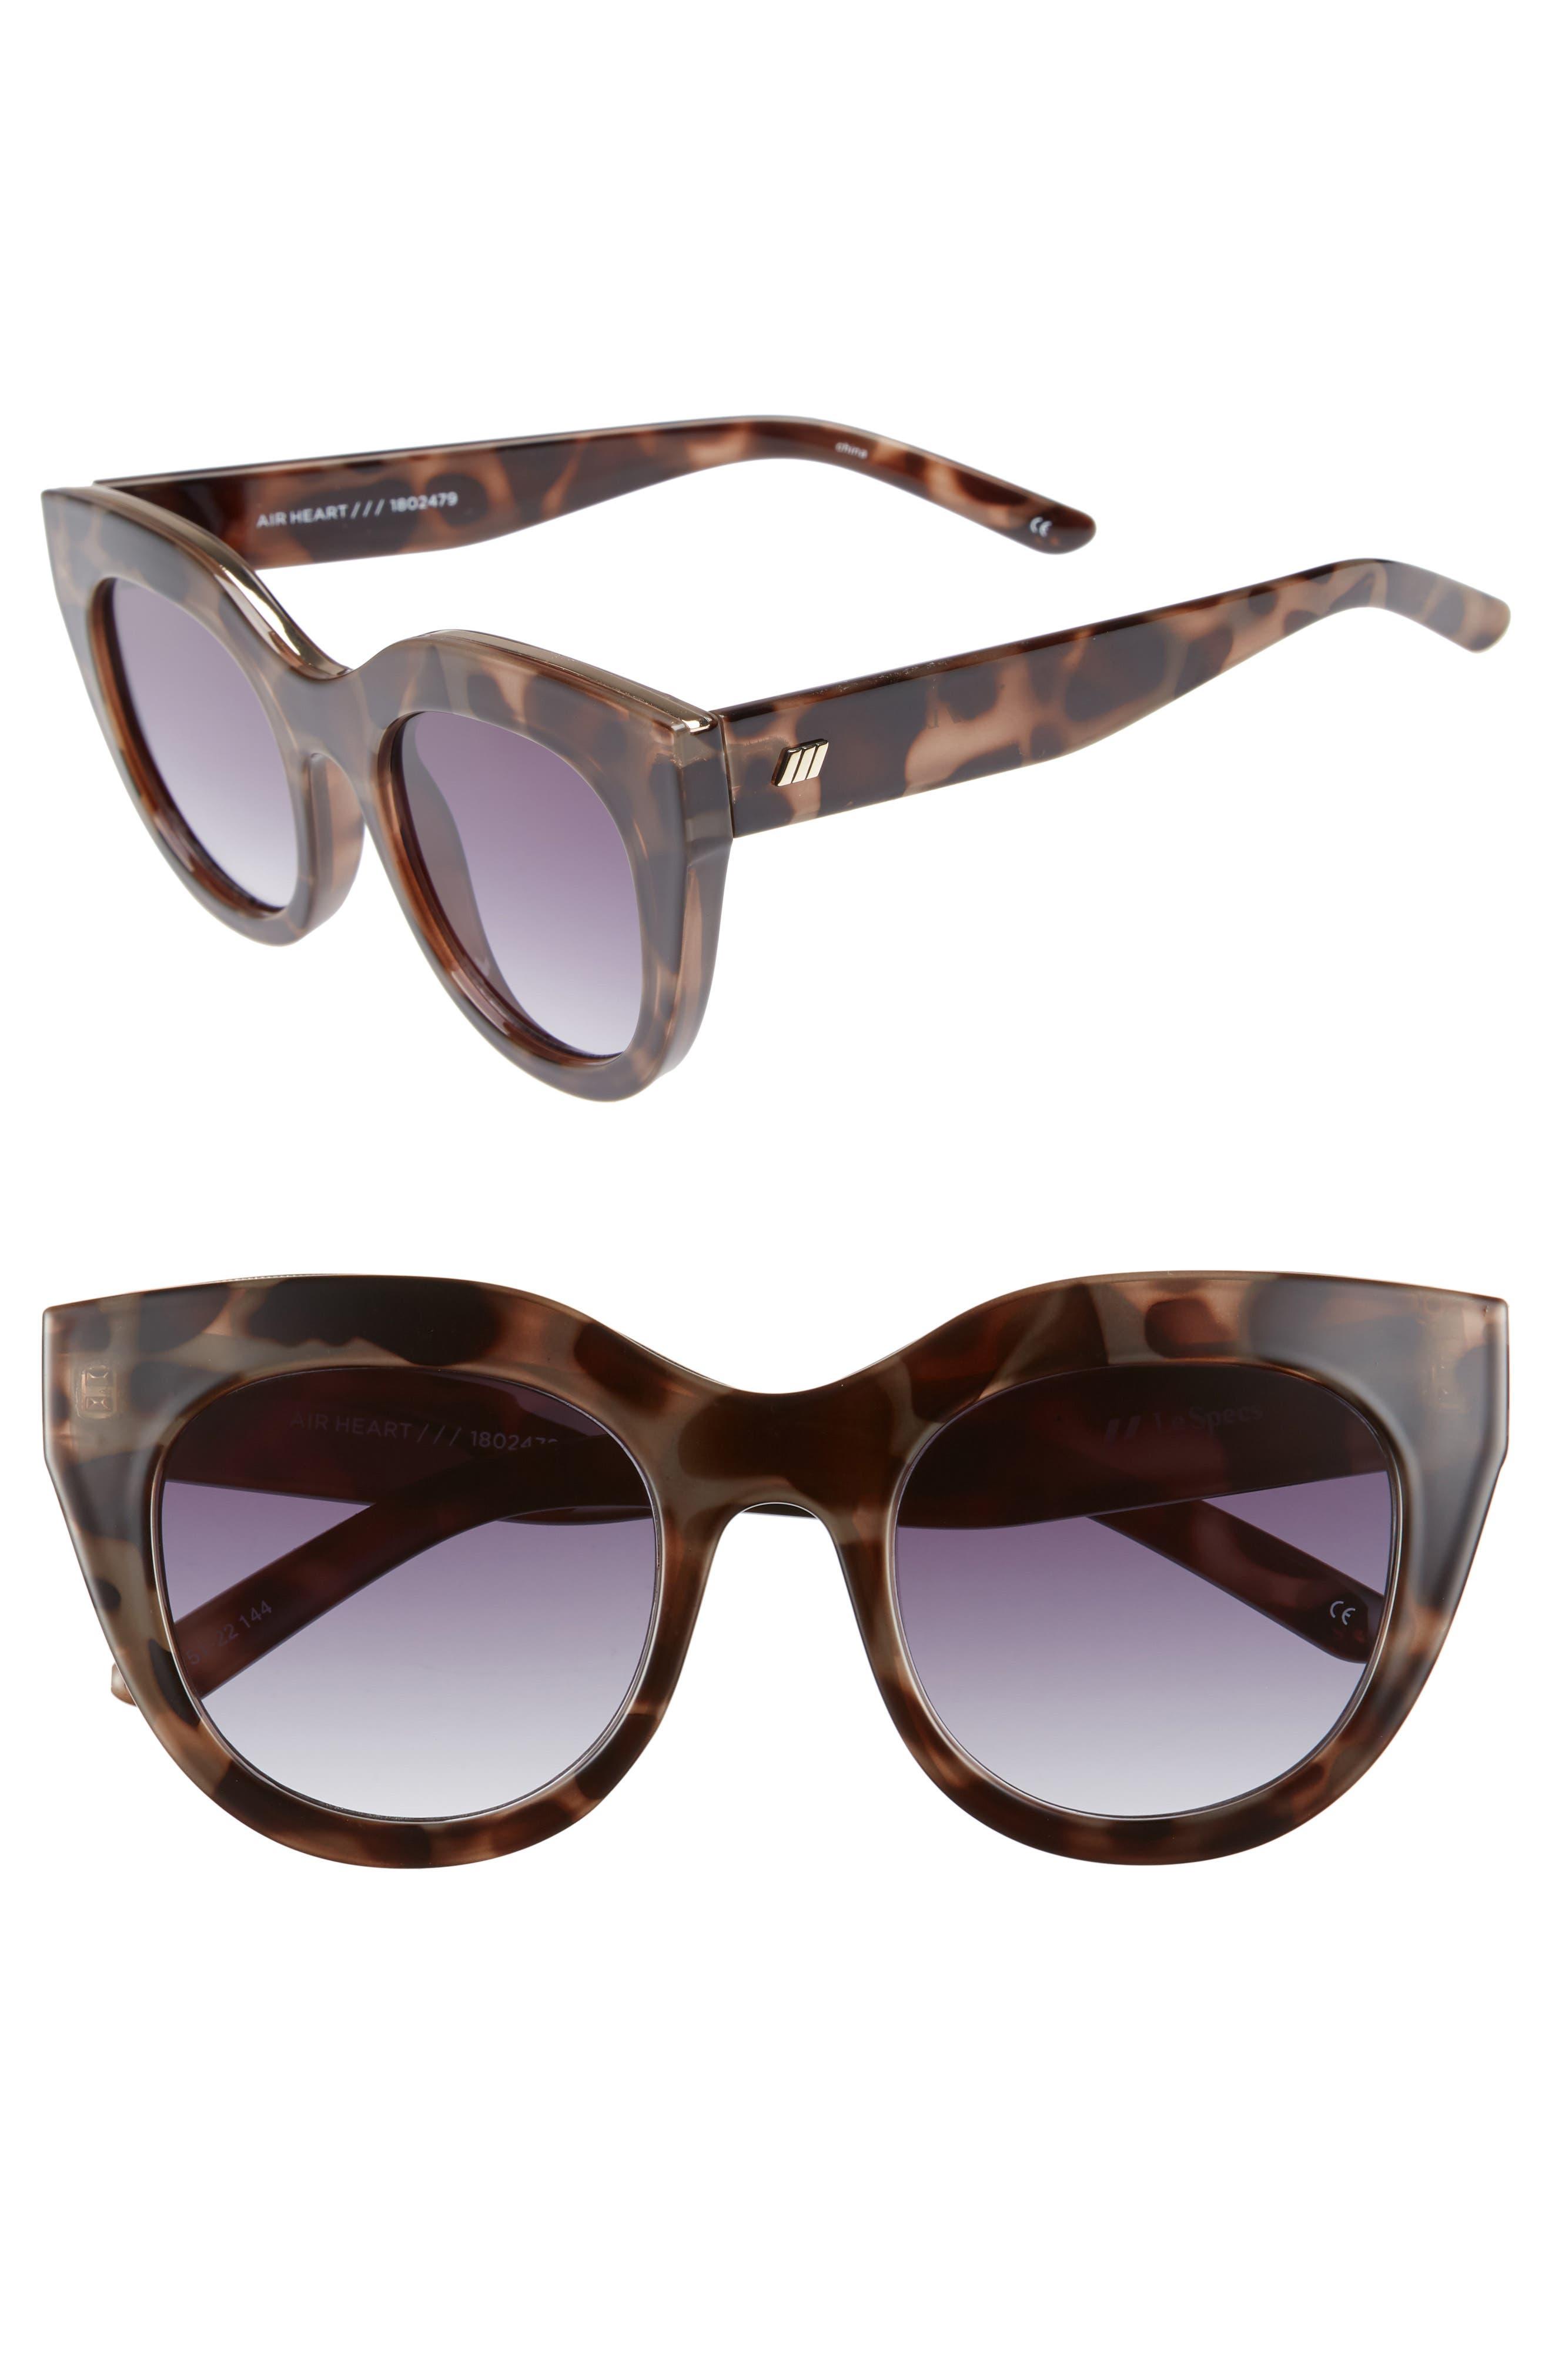 Air Heart 51mm Cat Eye Sunglasses,                         Main,                         color, VOLCANIC TORTOISE